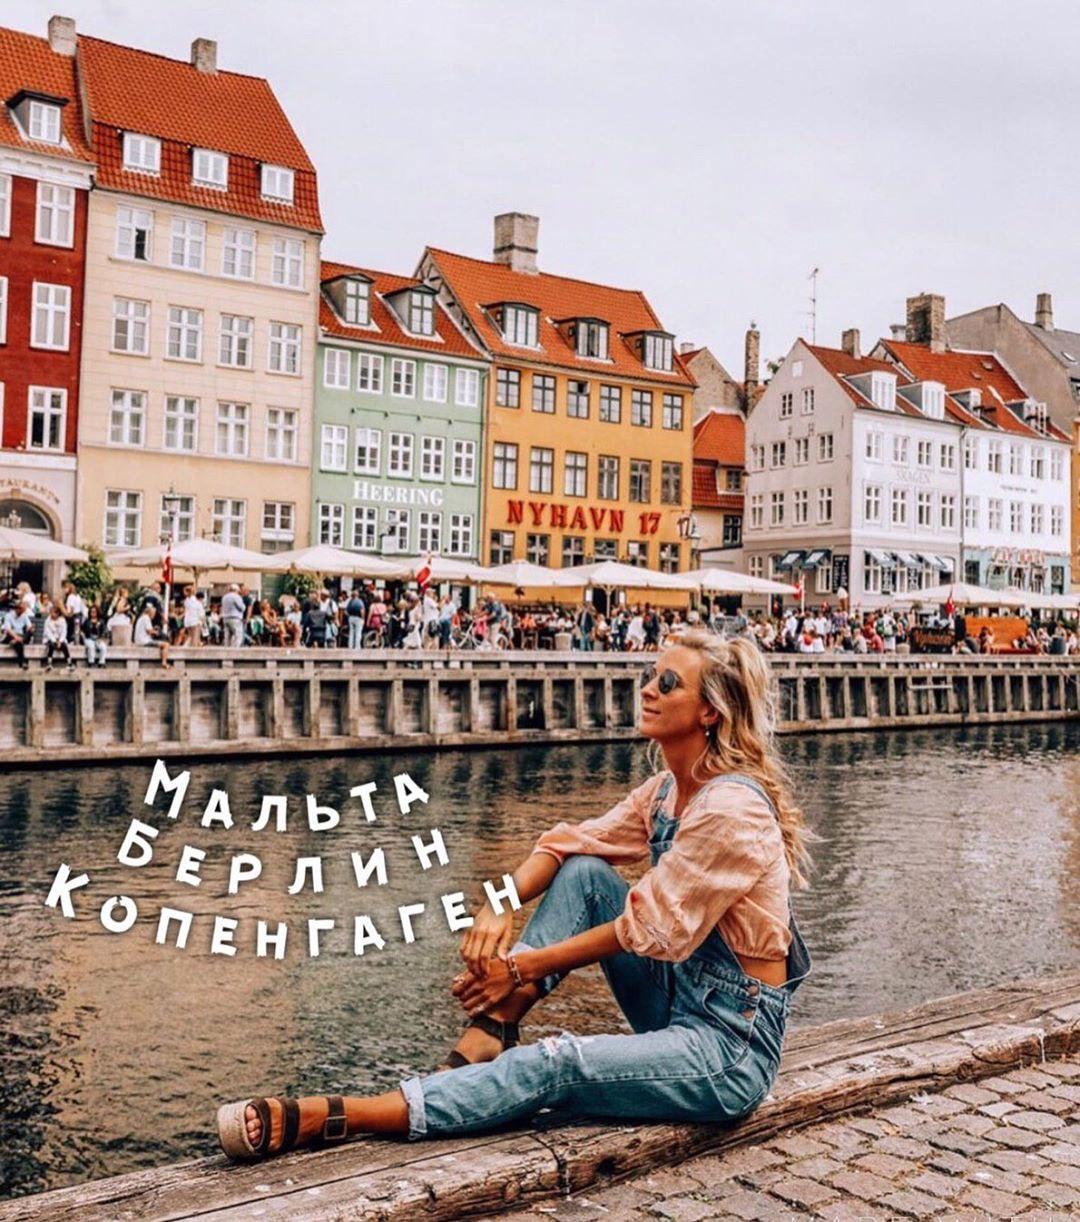 Мальта, Берлин, Копенгаген, Sparkle Travel